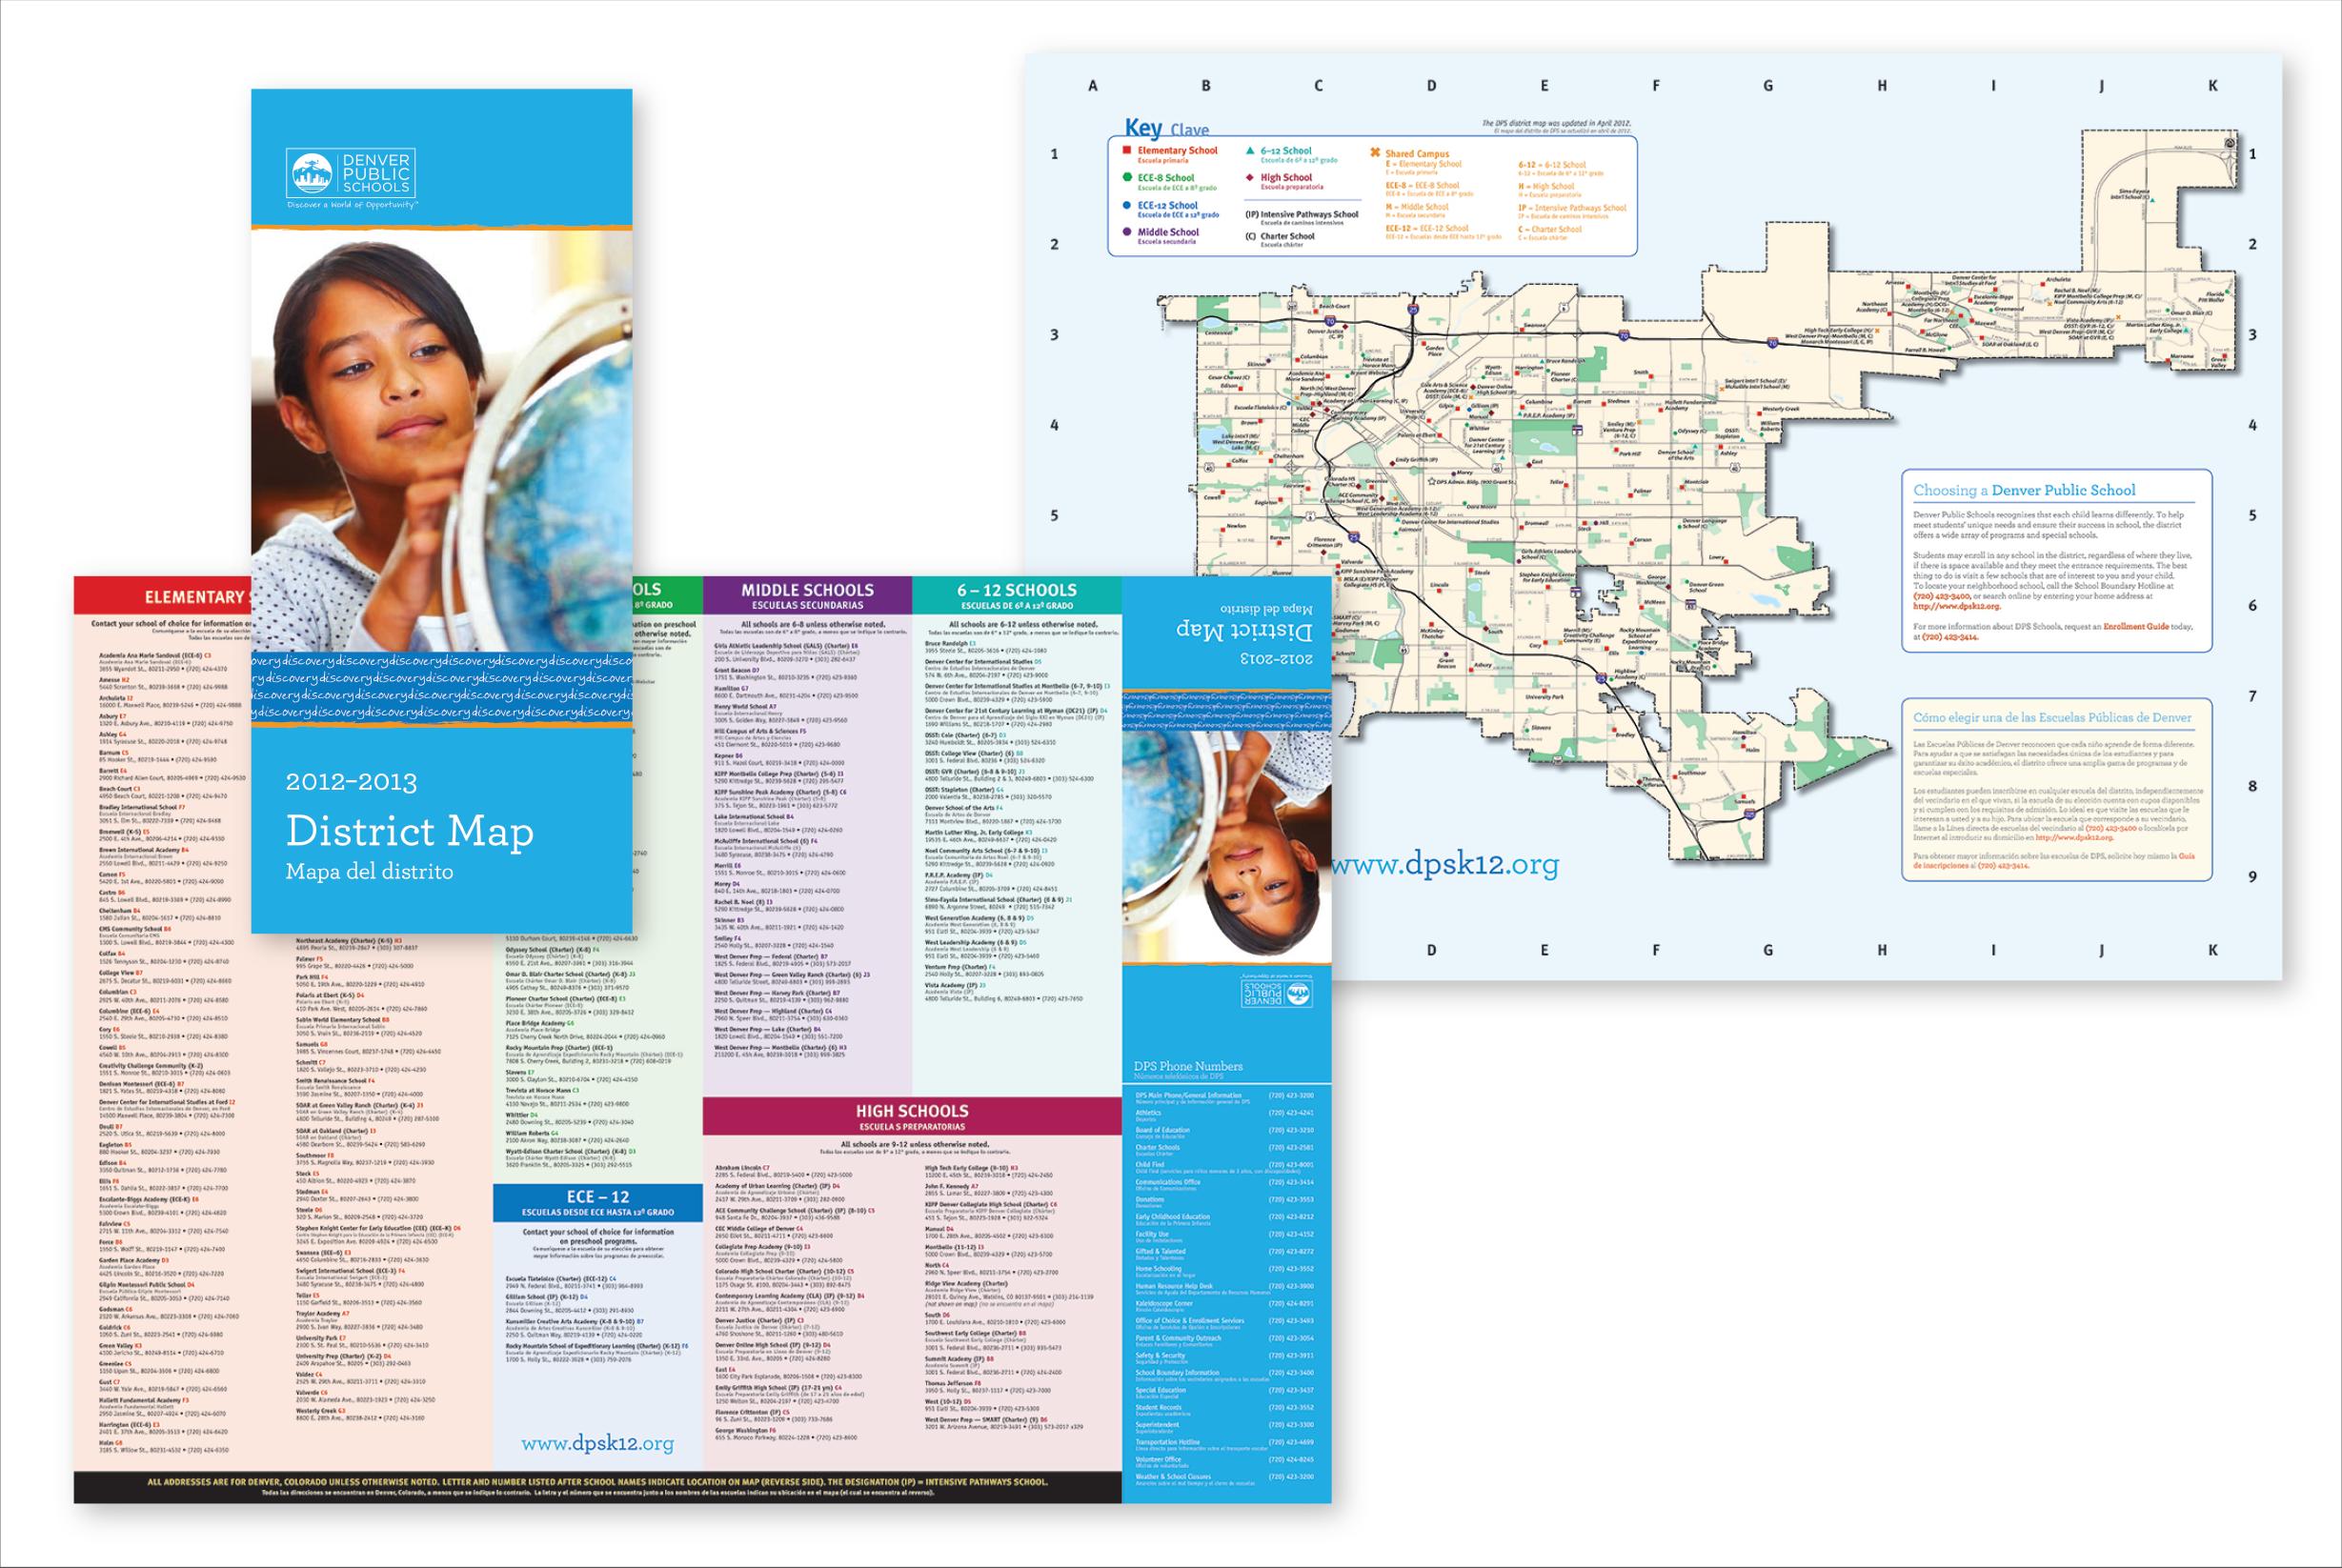 DPS Foldout District Map